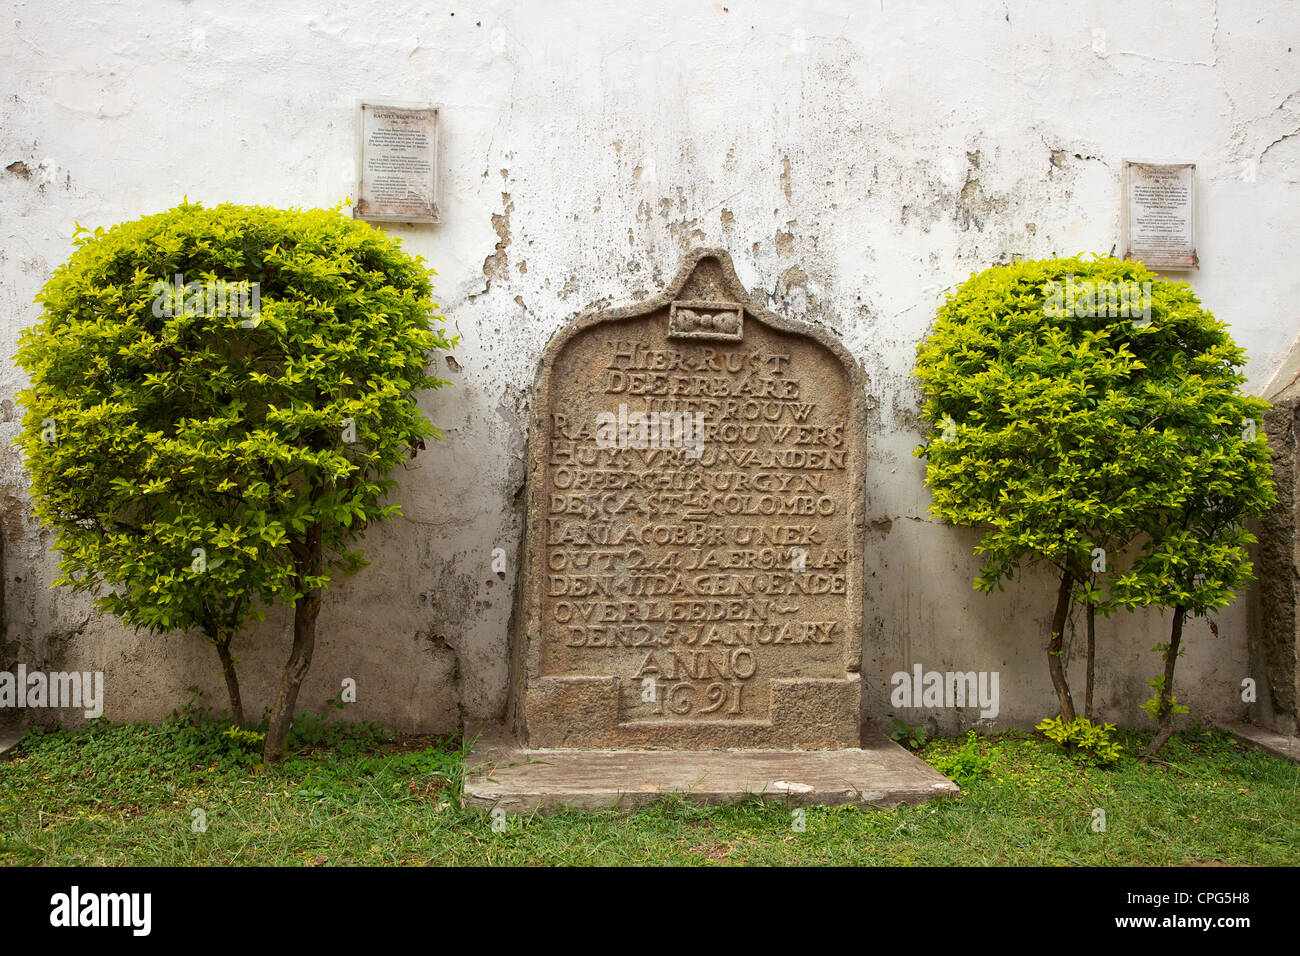 Gravestone outside the Wolvendaal Dutch Reformed Church, Colombo, Sri Lanka, Asia - Stock Image